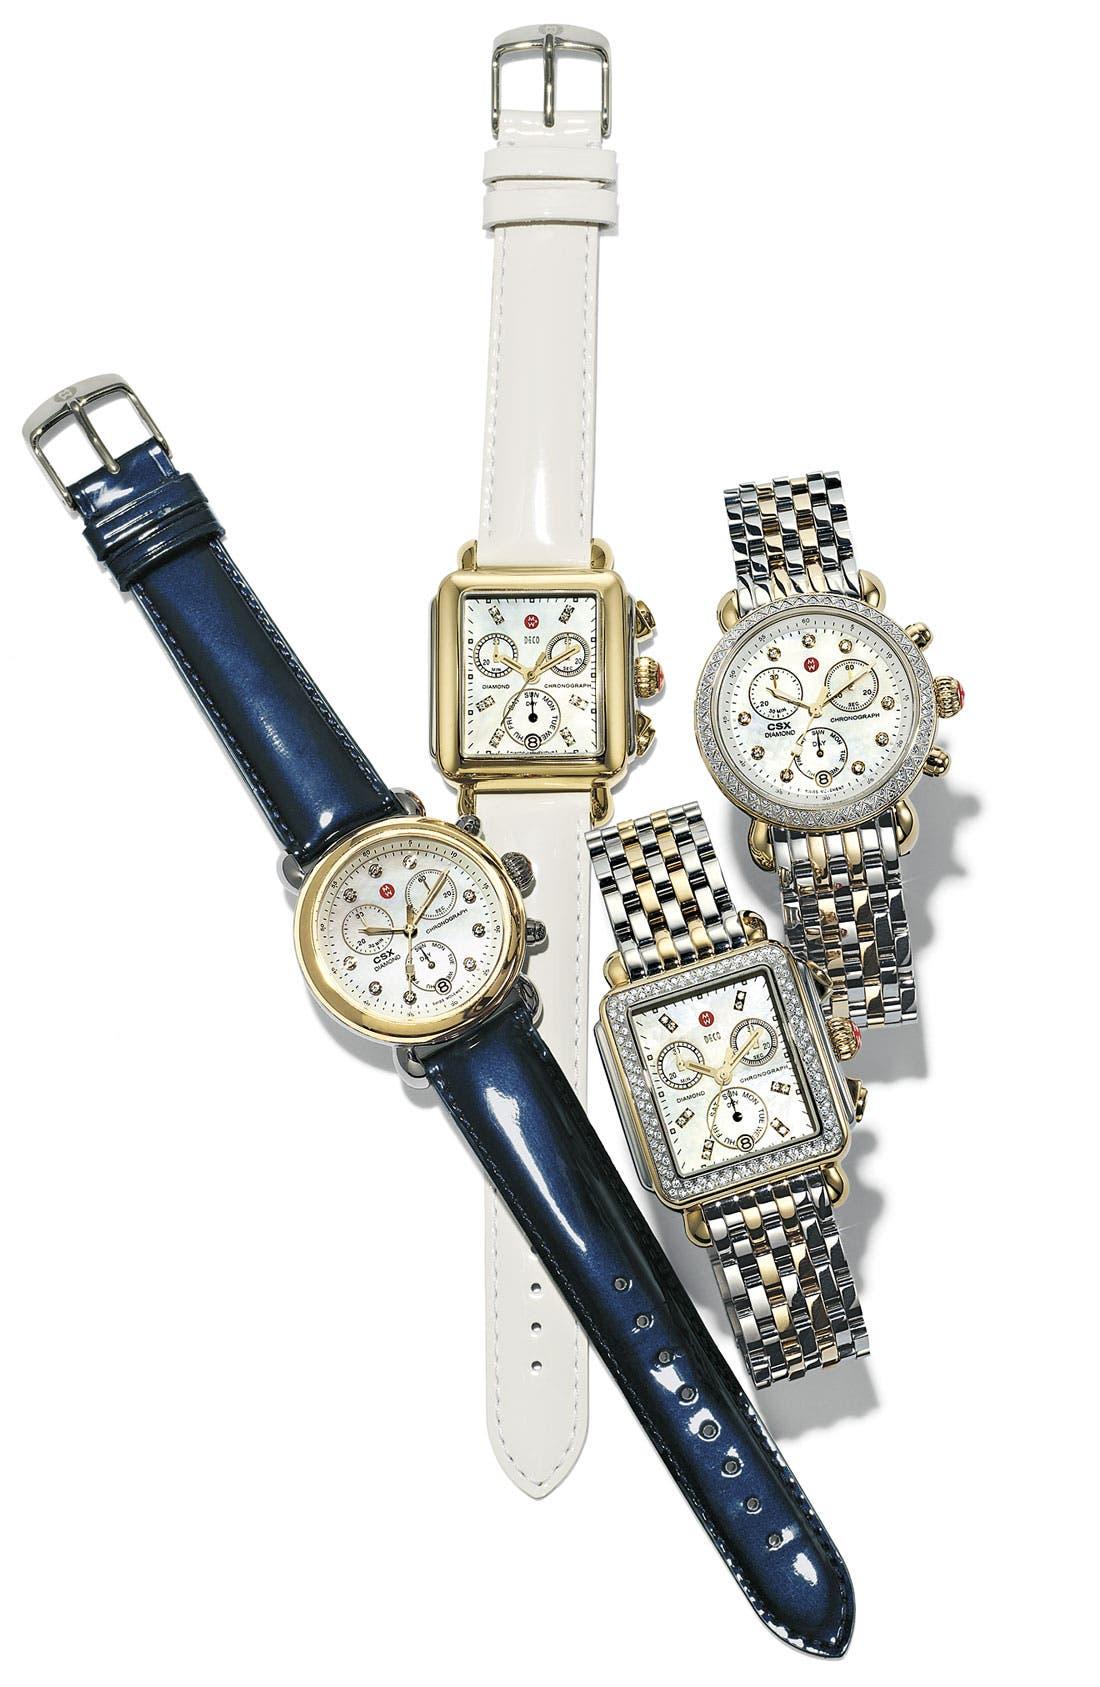 Main Image - MICHELE 'CSX-36 Diamond' Diamond Dial Two-Tone Watch Case & 18mm Bracelet